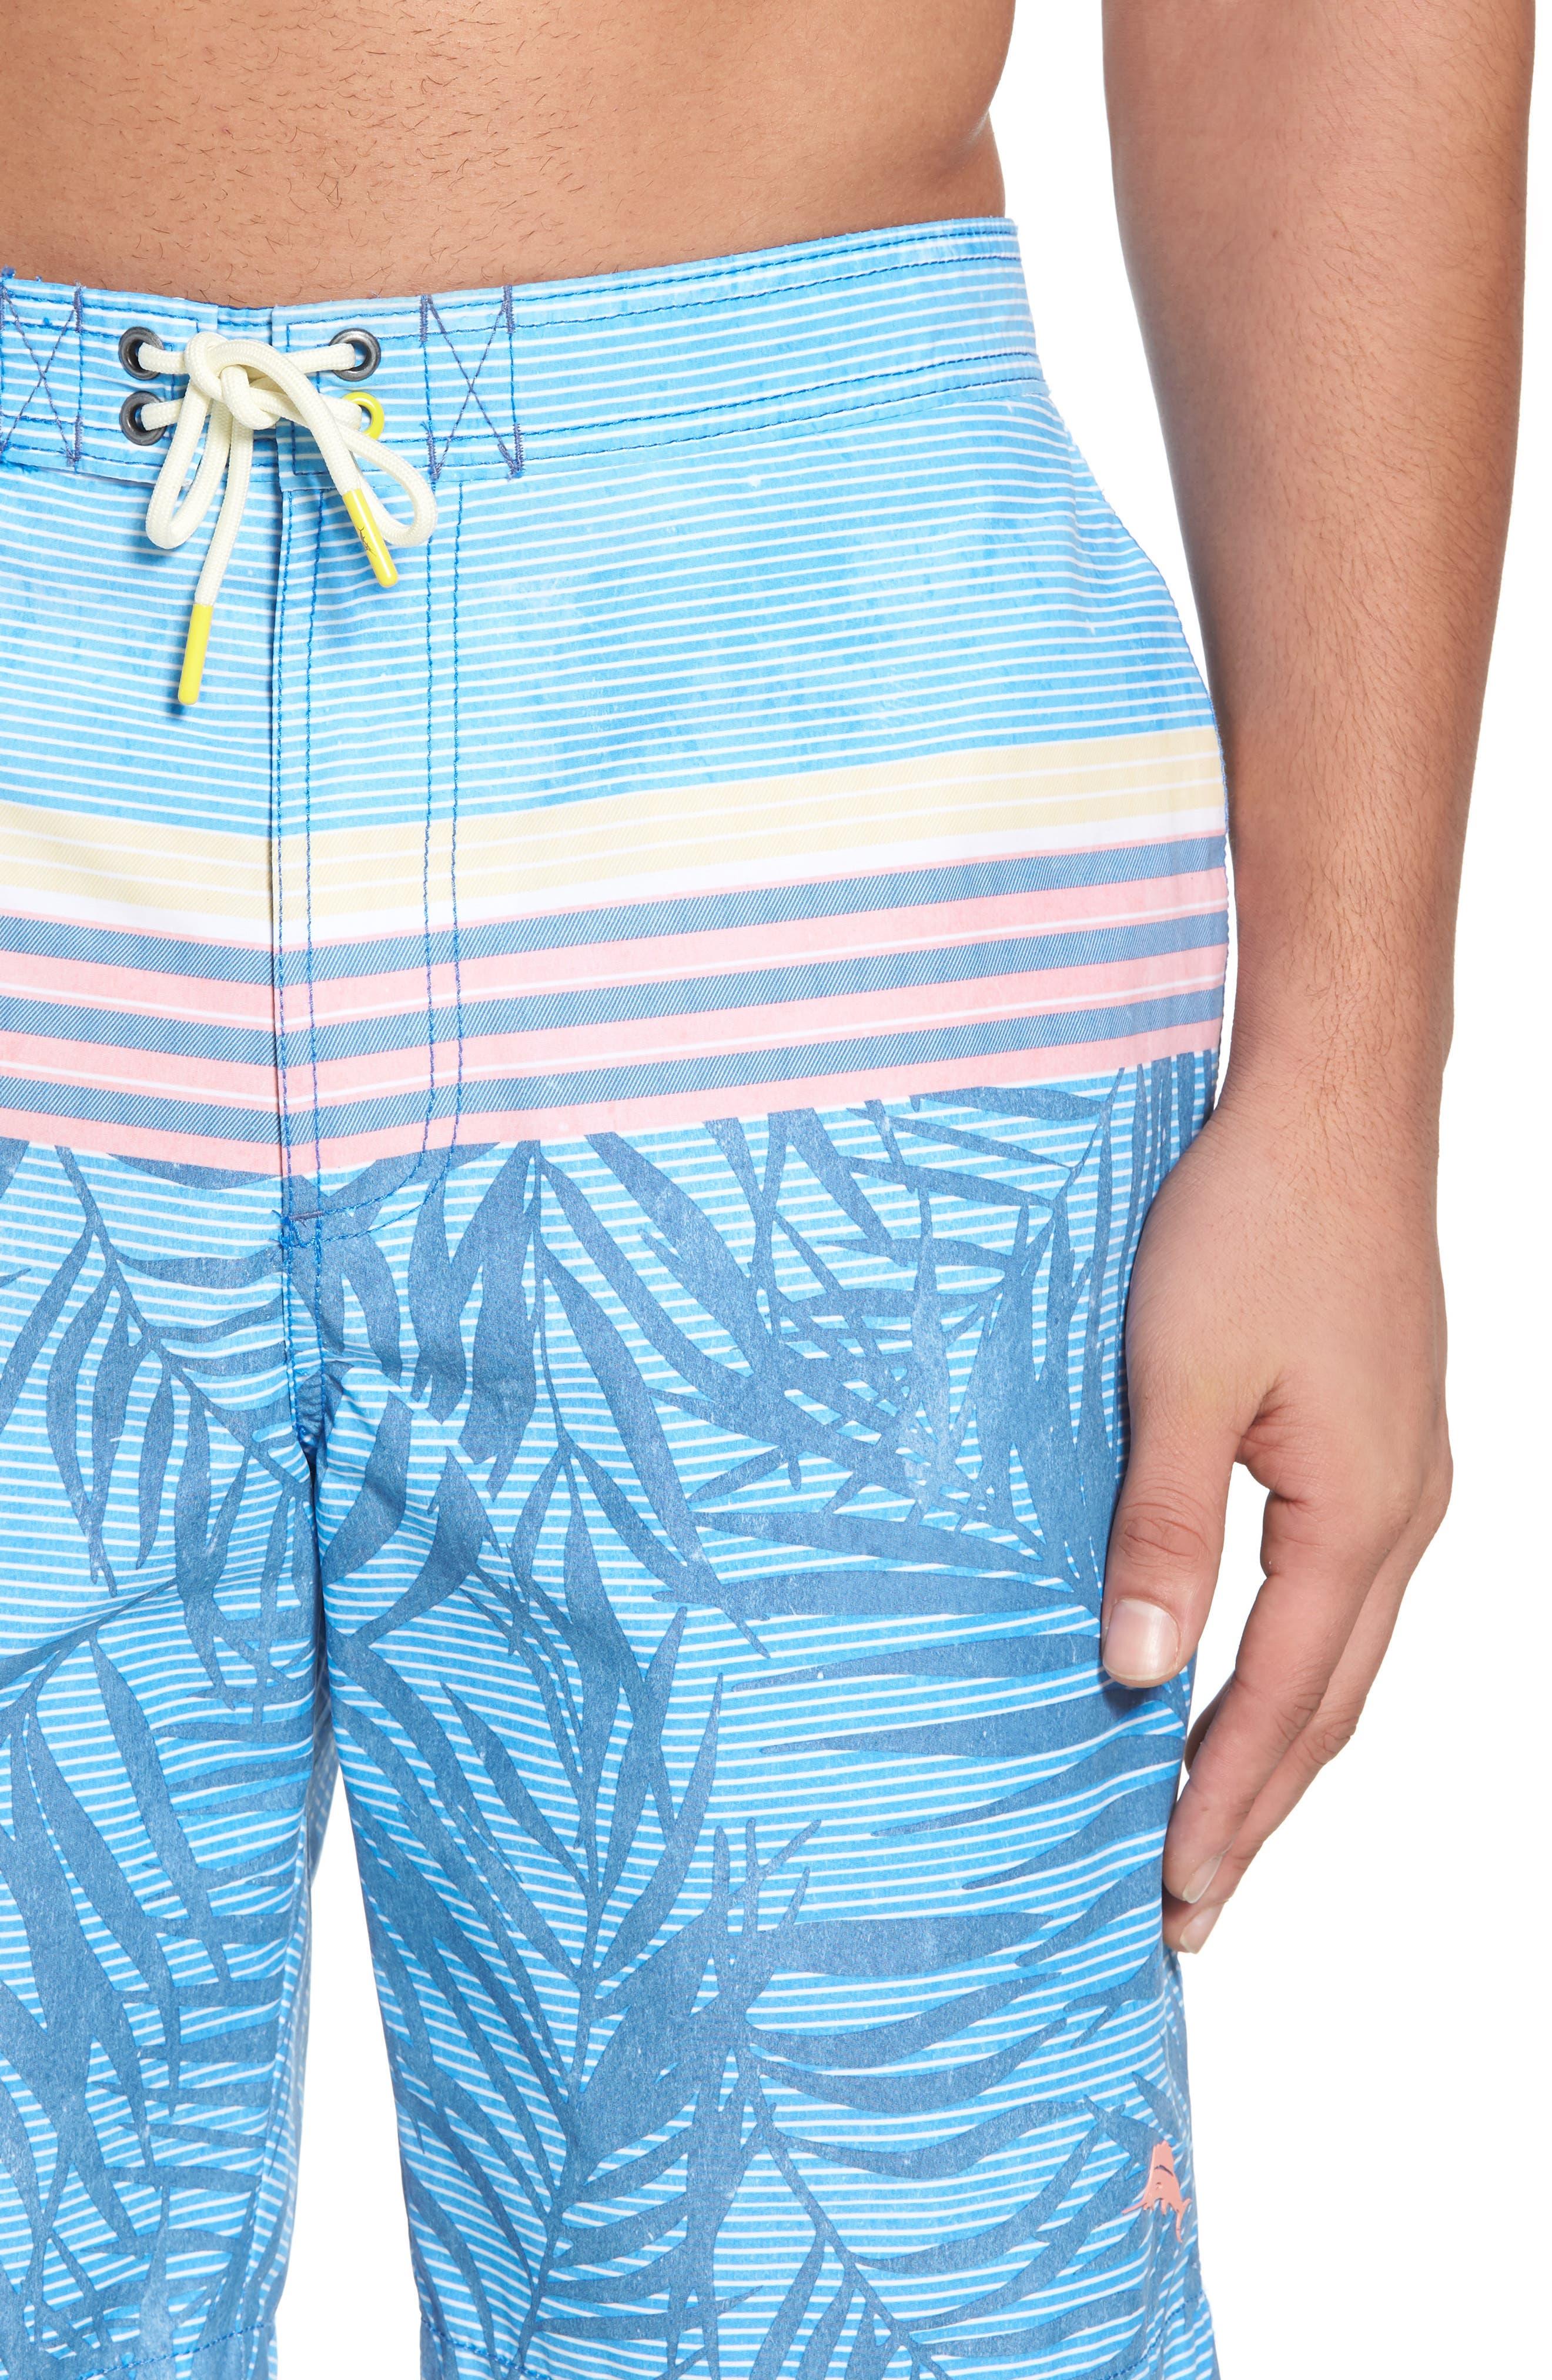 TOMMY BAHAMA,                             Baja Fronds & Stripes Board Shorts,                             Alternate thumbnail 4, color,                             400